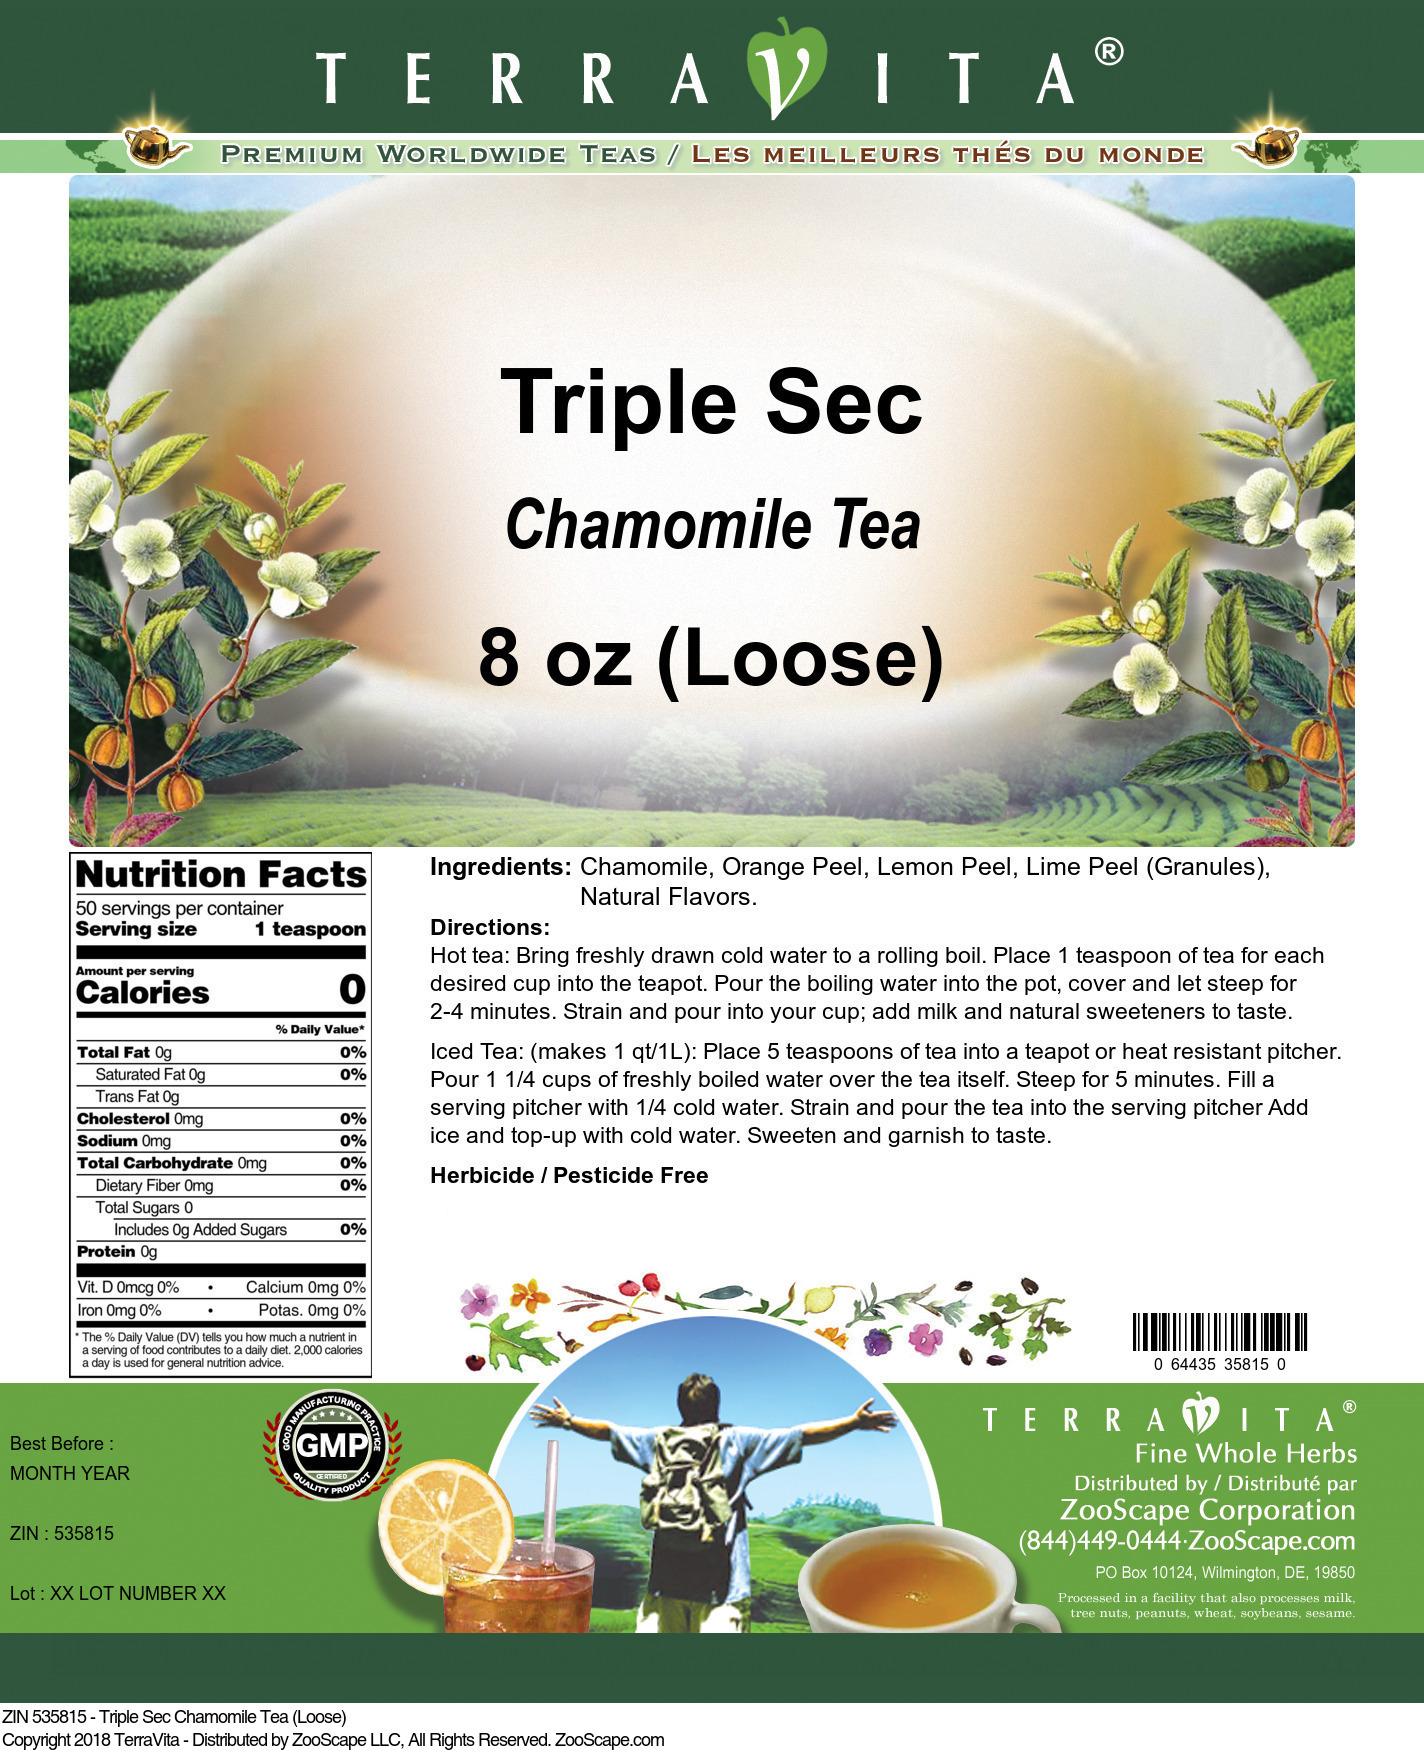 Triple Sec Chamomile Tea